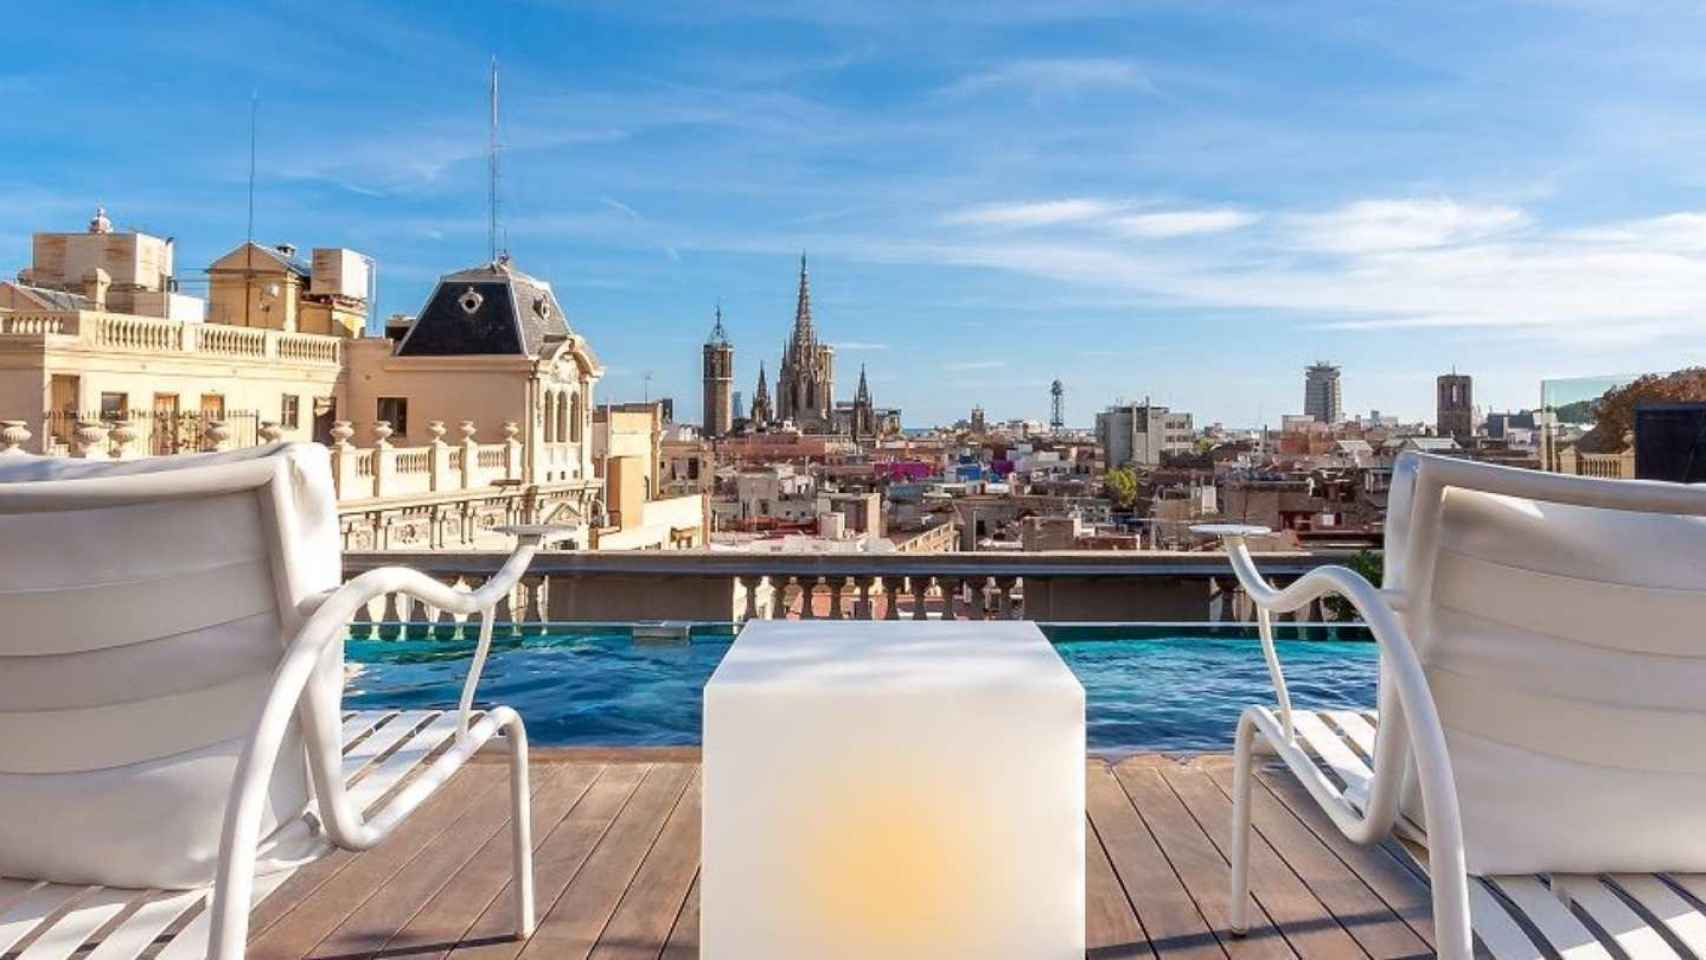 Ohla Barcelona.